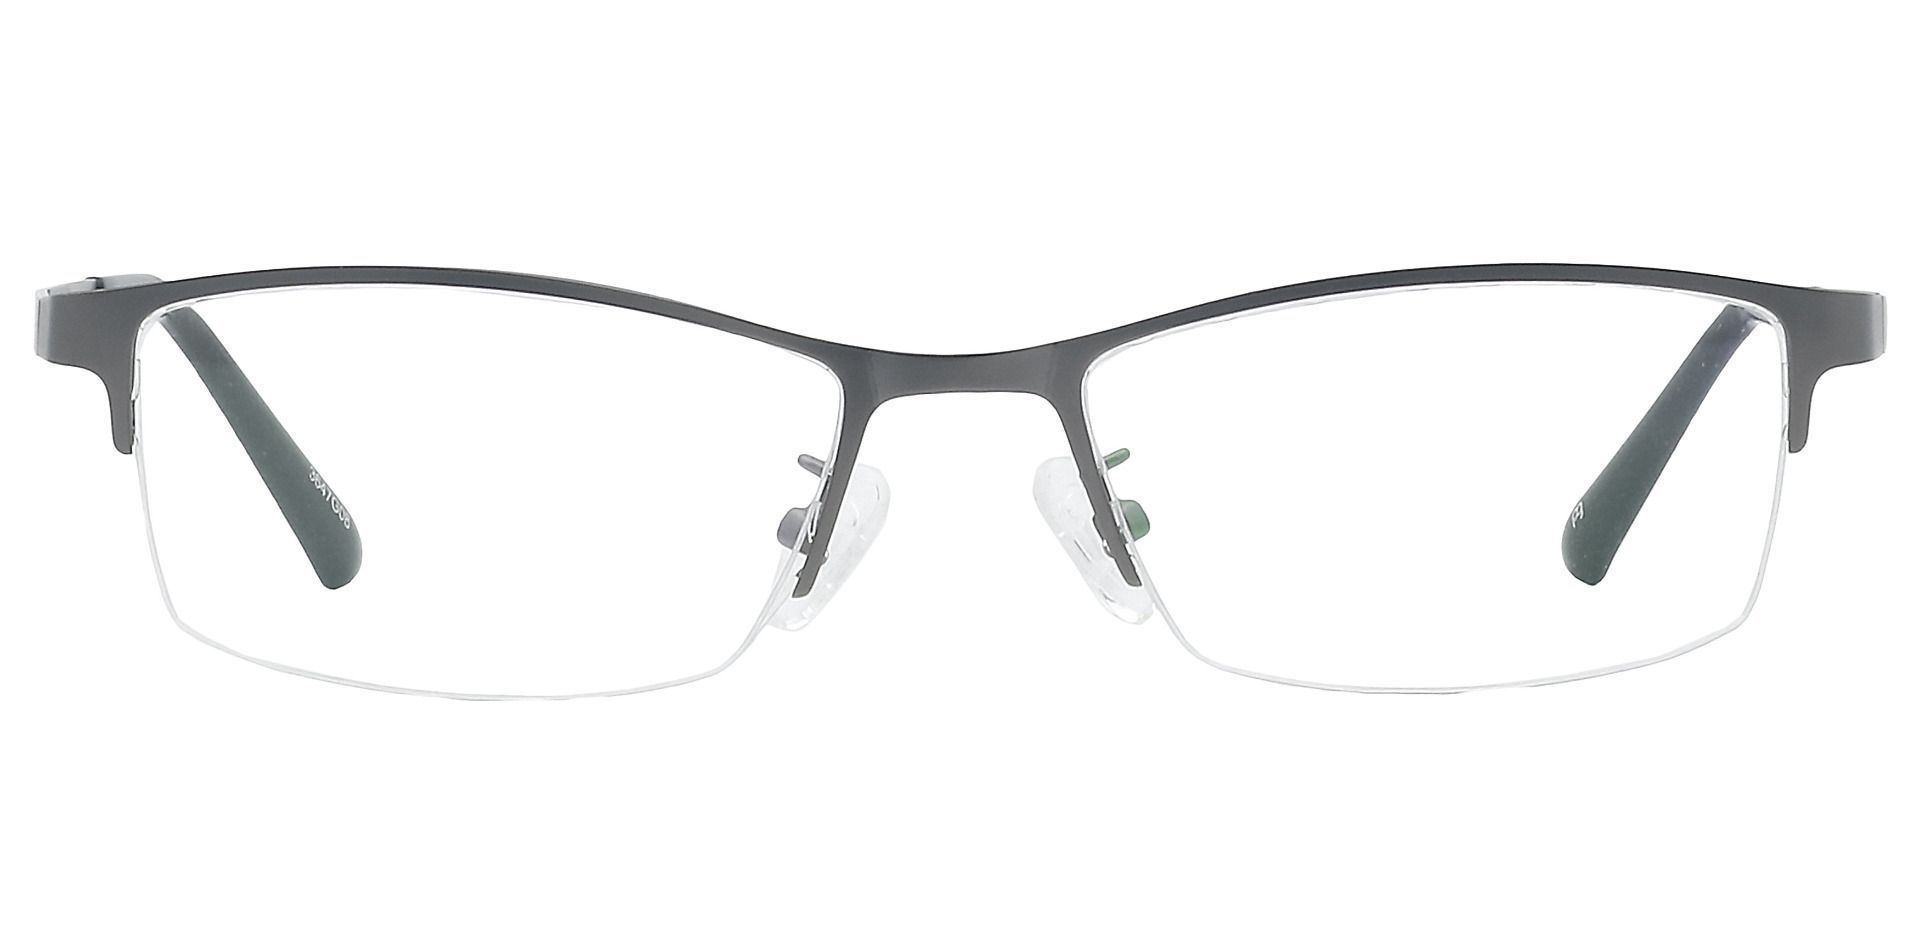 Willis Rectangle Progressive Glasses - Gray